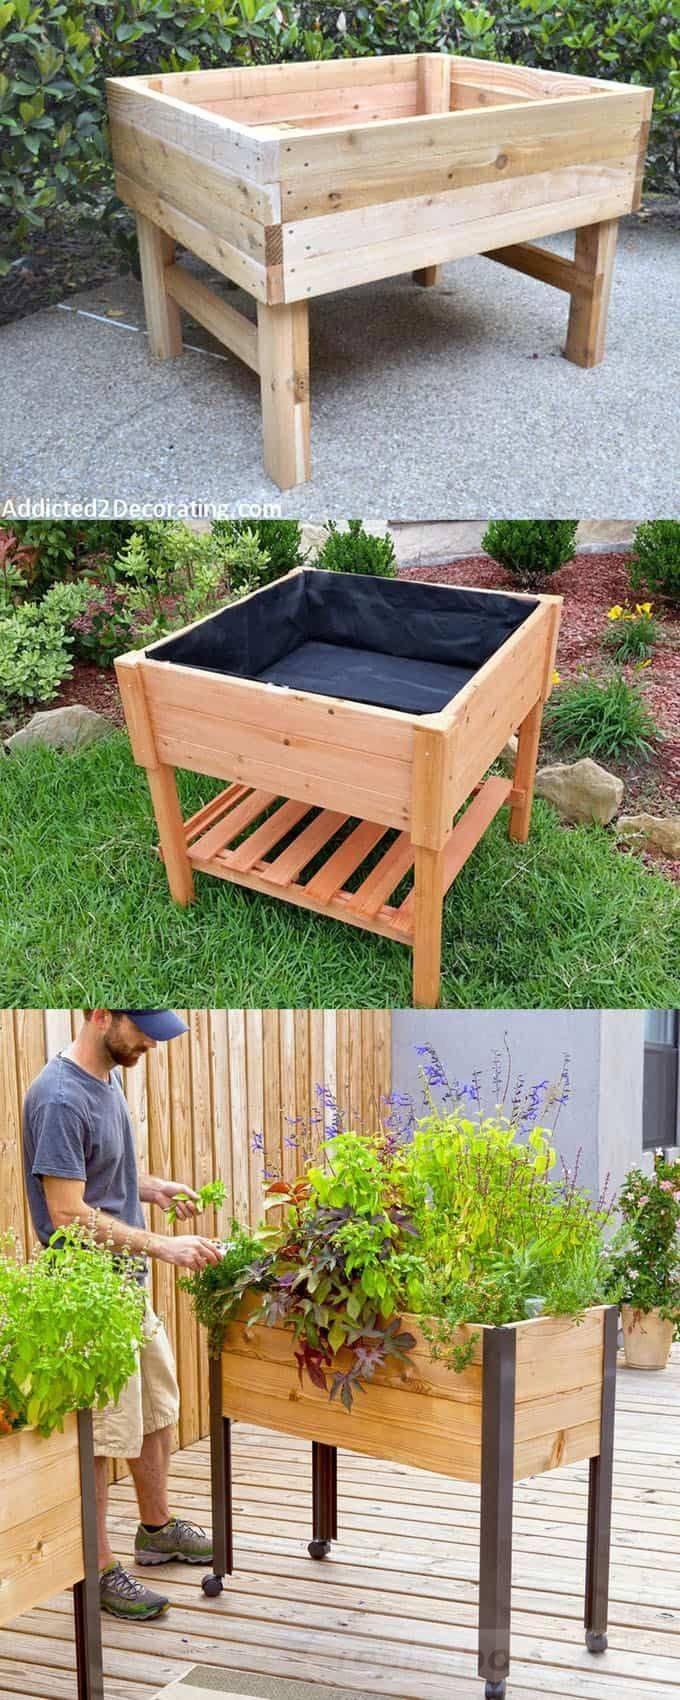 creative garden ideas-AUohyhrYB_XmVzAKs99QdylAnKA3eRR_OAPyDDQxQ71UA_IQcOHdrlU